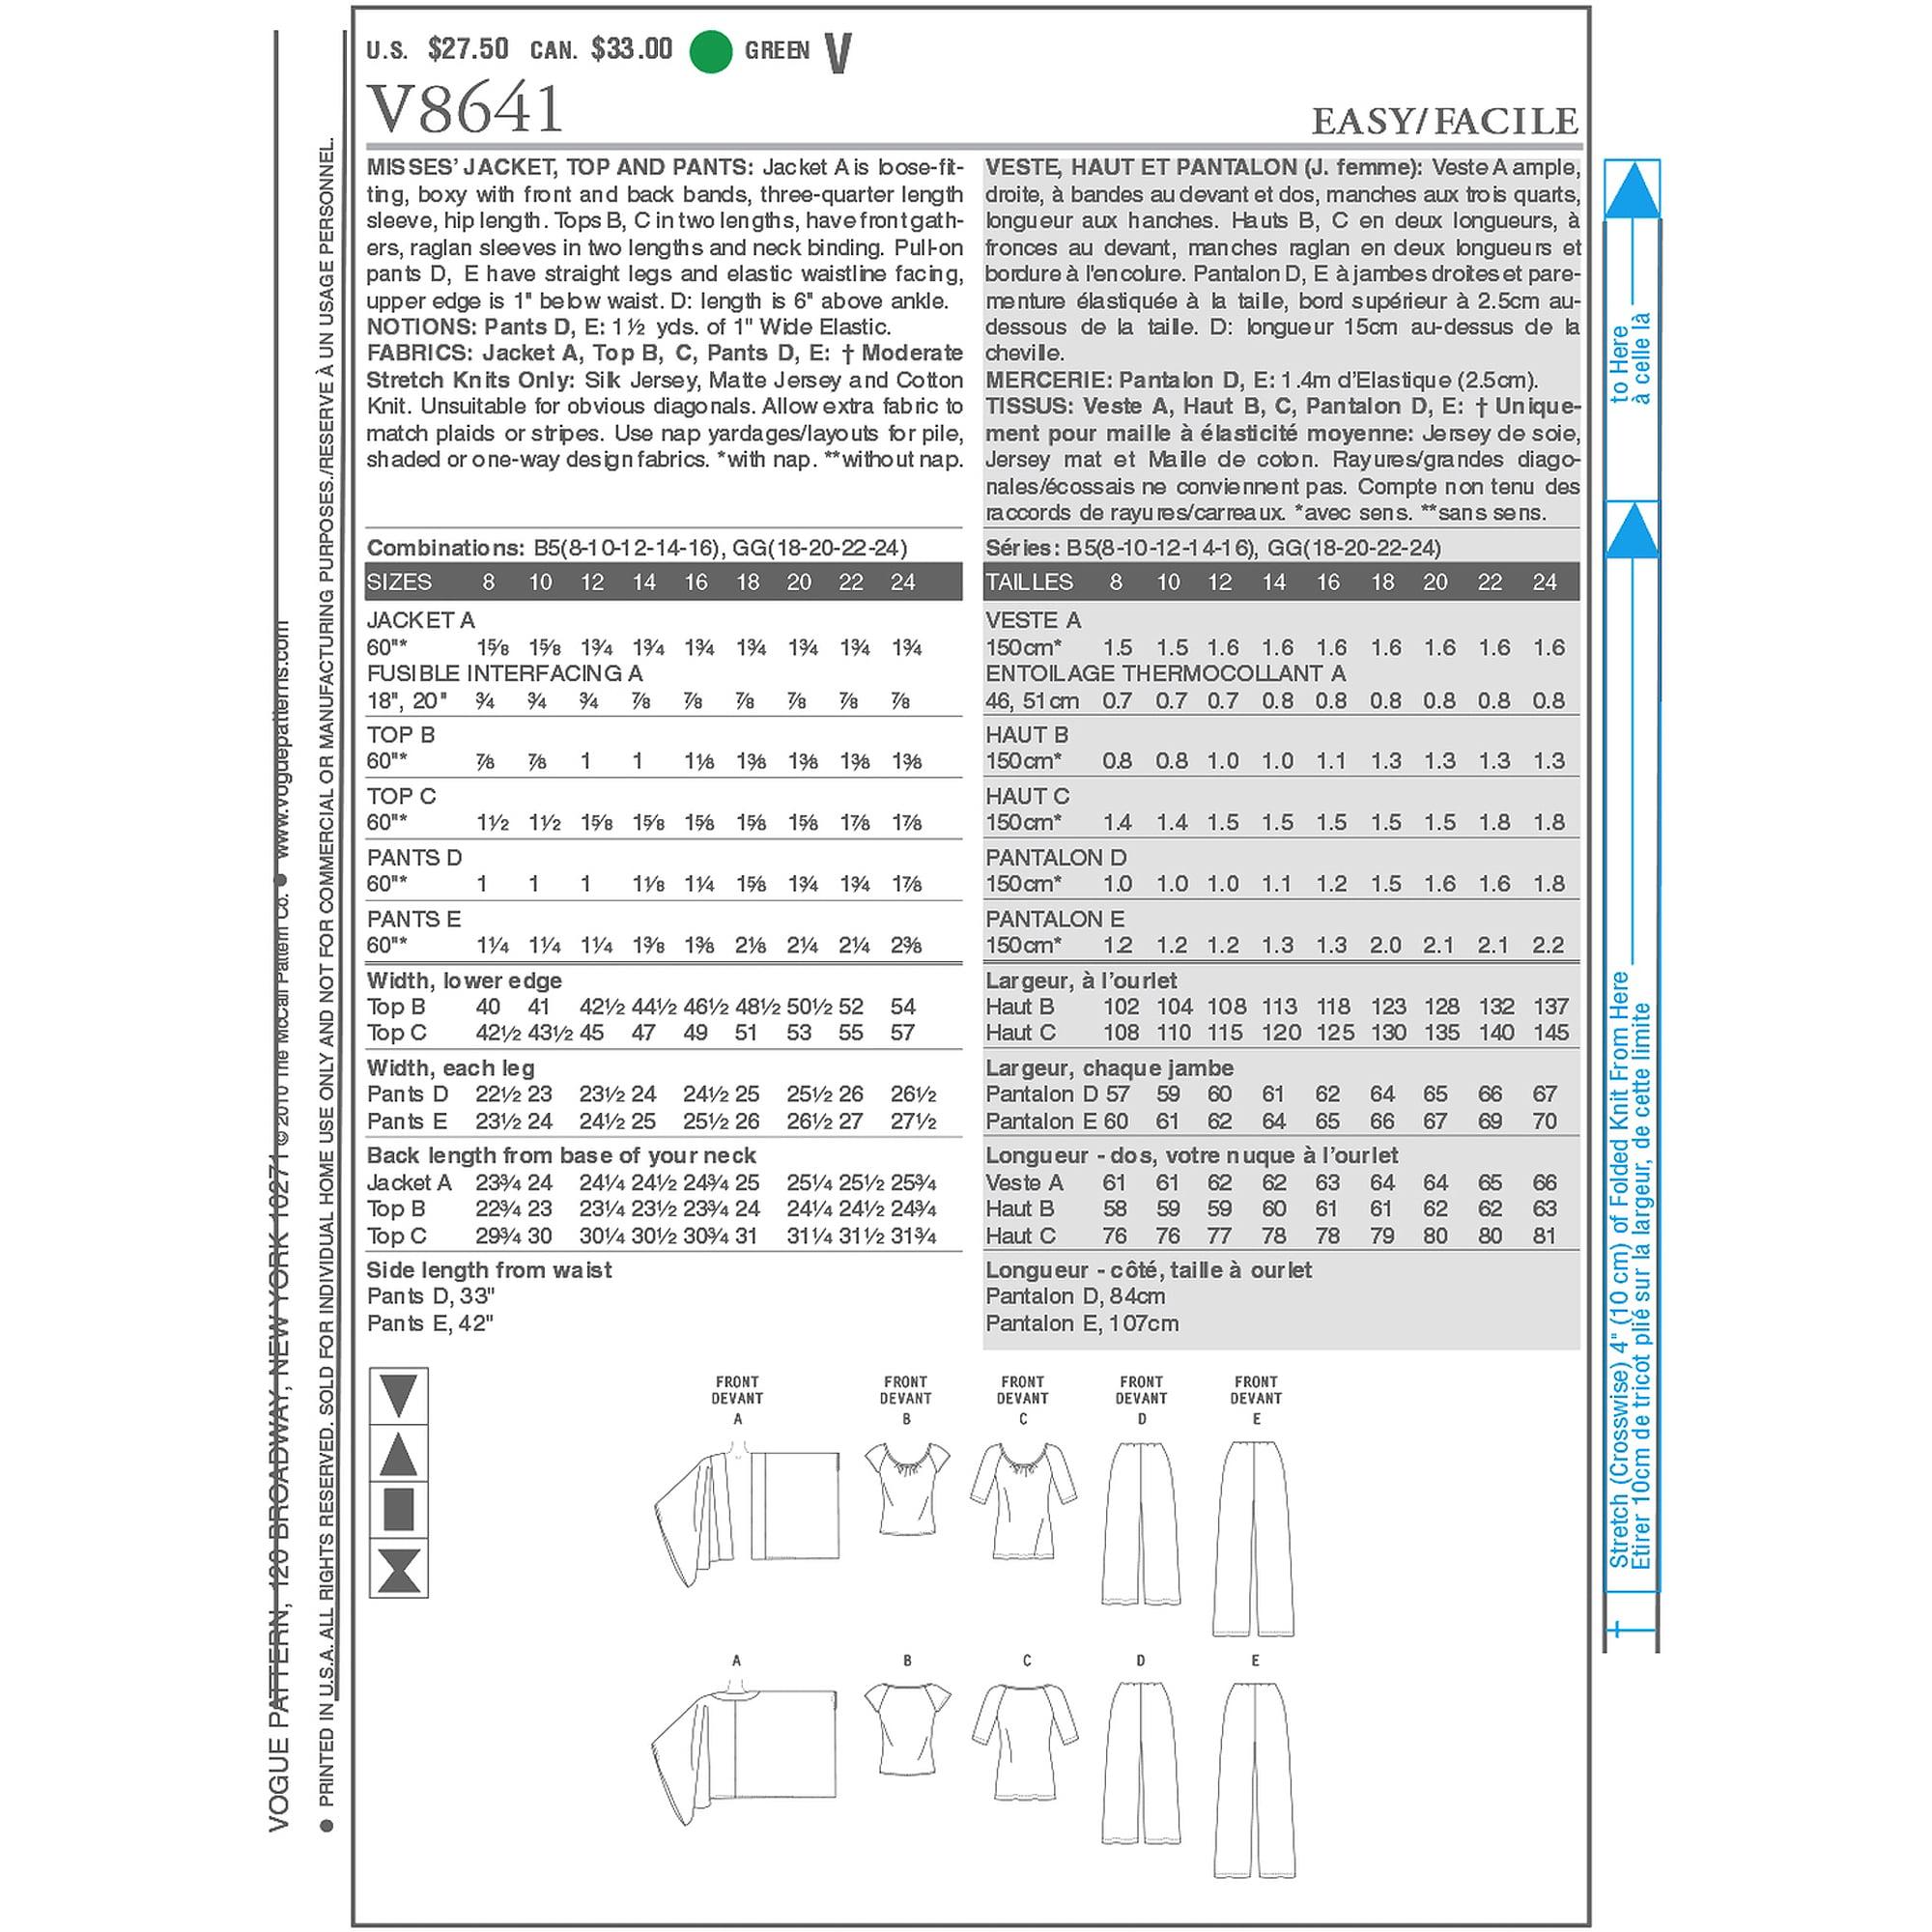 Vogue Pattern Misses' Jacket, Top and Pants, (8, 10, 12, 14, 16)